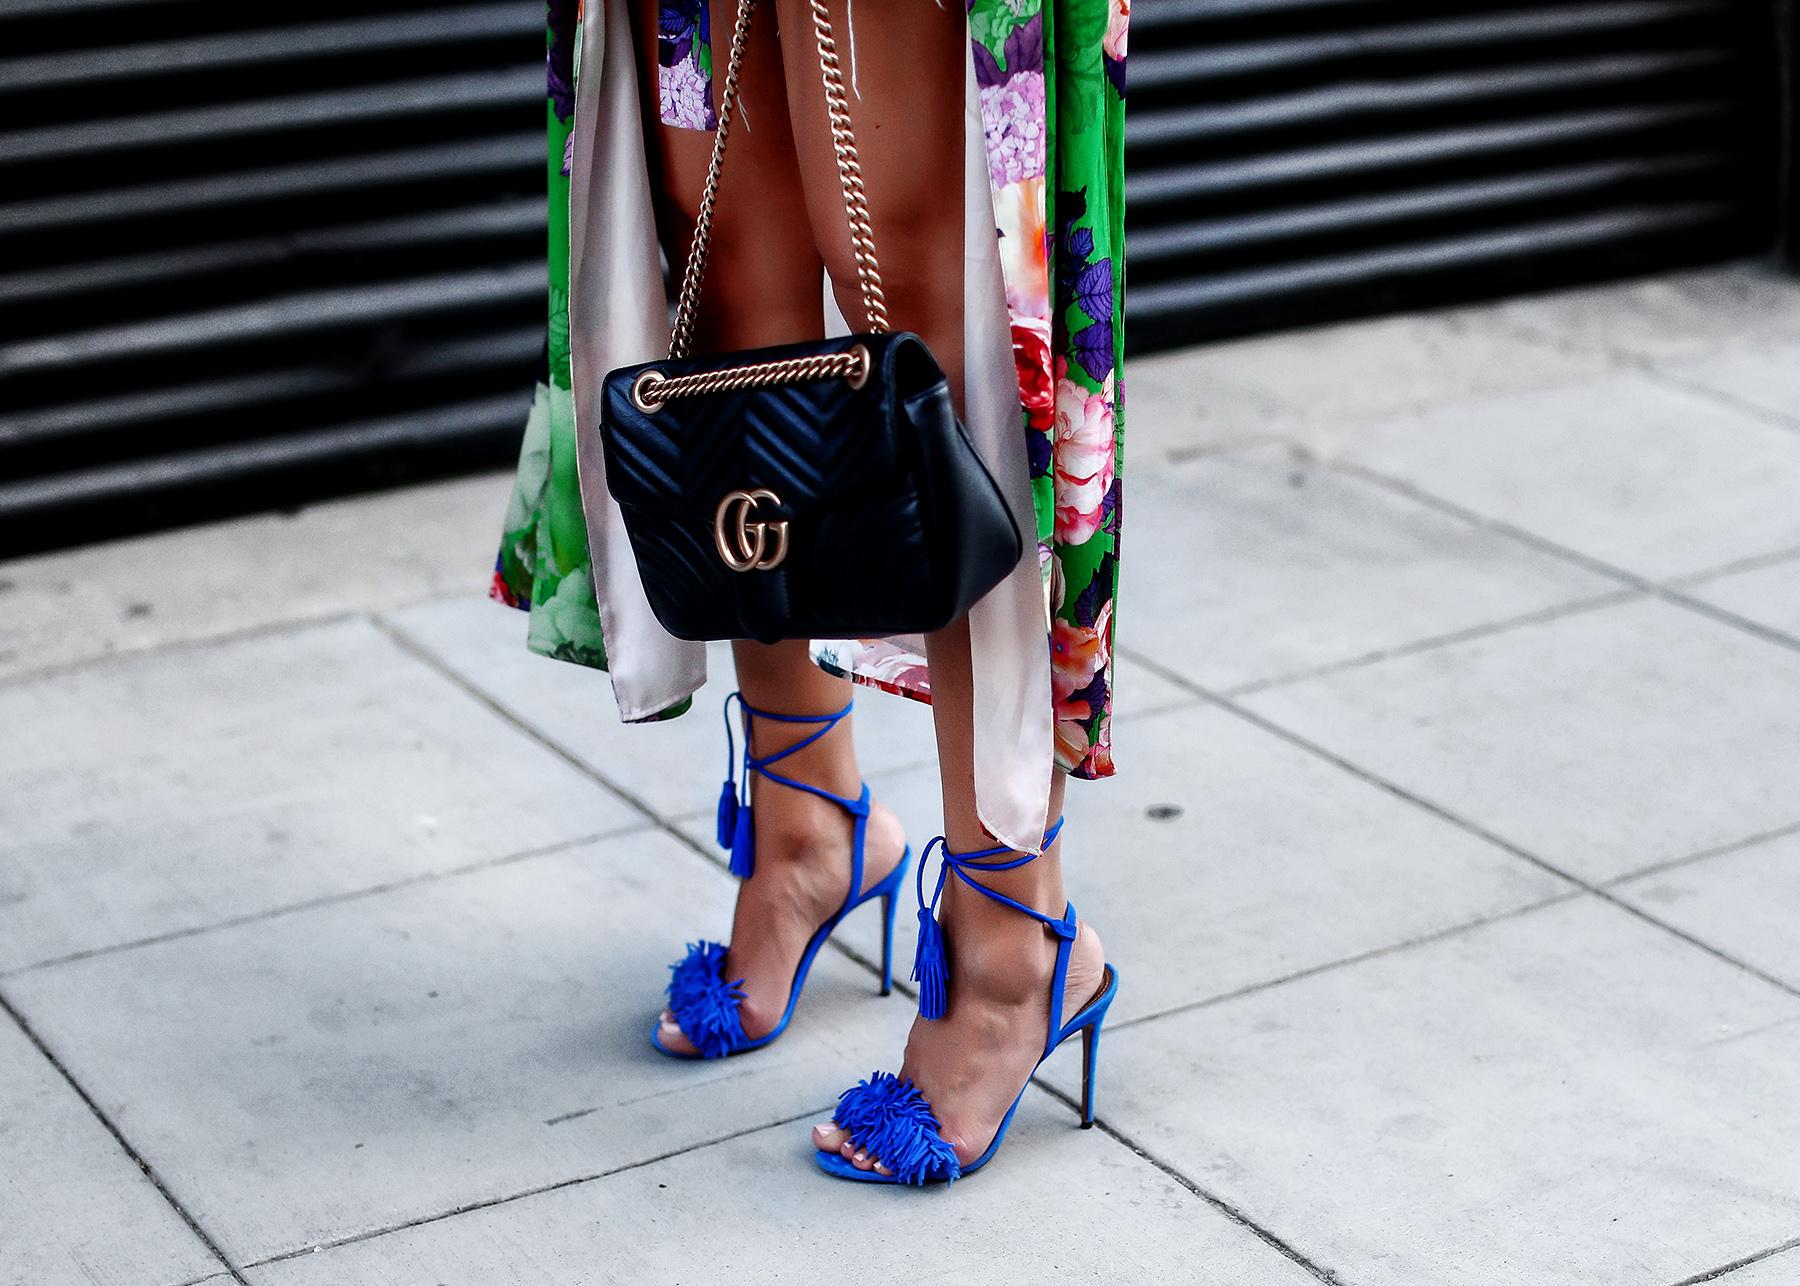 Aquazzura Wild Thing Sandals and Gucci Marmont Bag.jpg